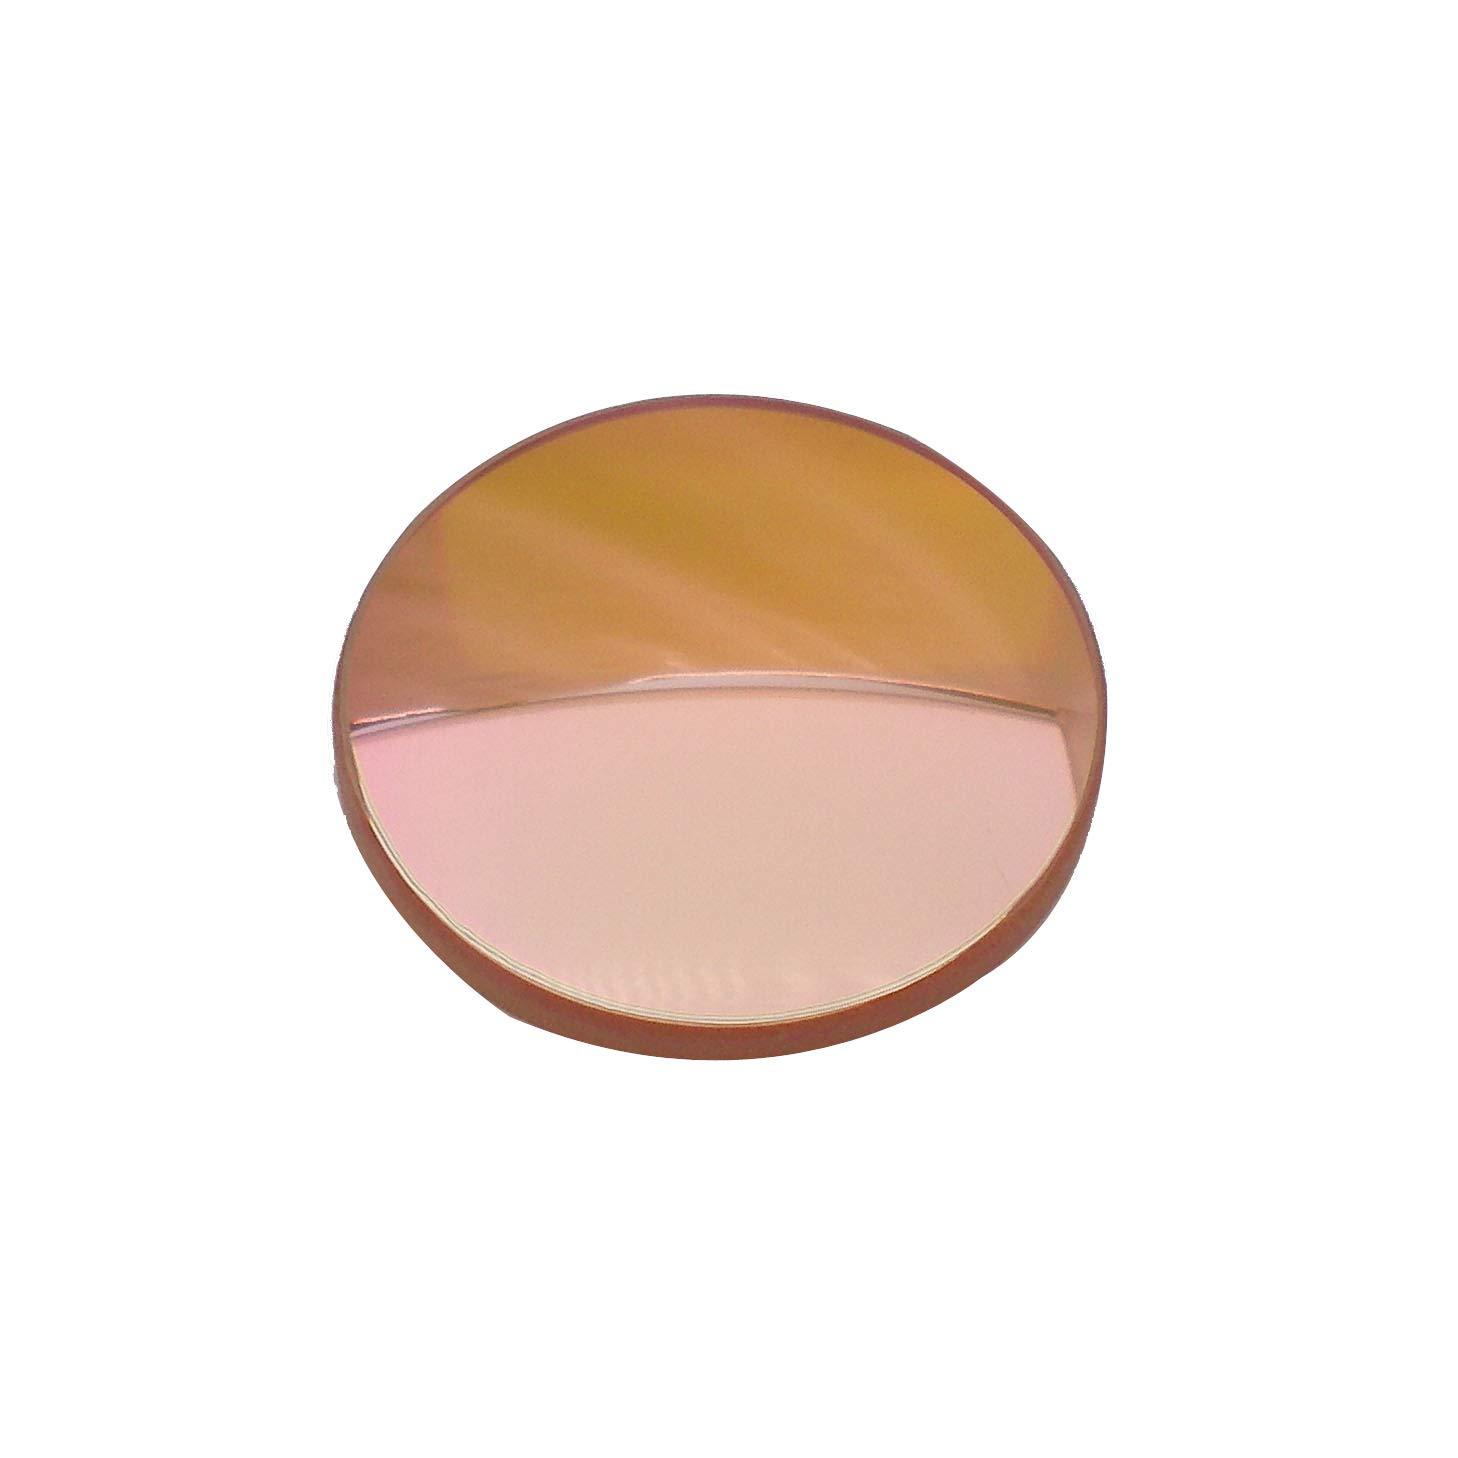 20mm ZnSe Focus Lens for CO2 10600nm 10.6um Laser Engraver/Cutter Dia:20mm FL: 3'' or 76.2mm